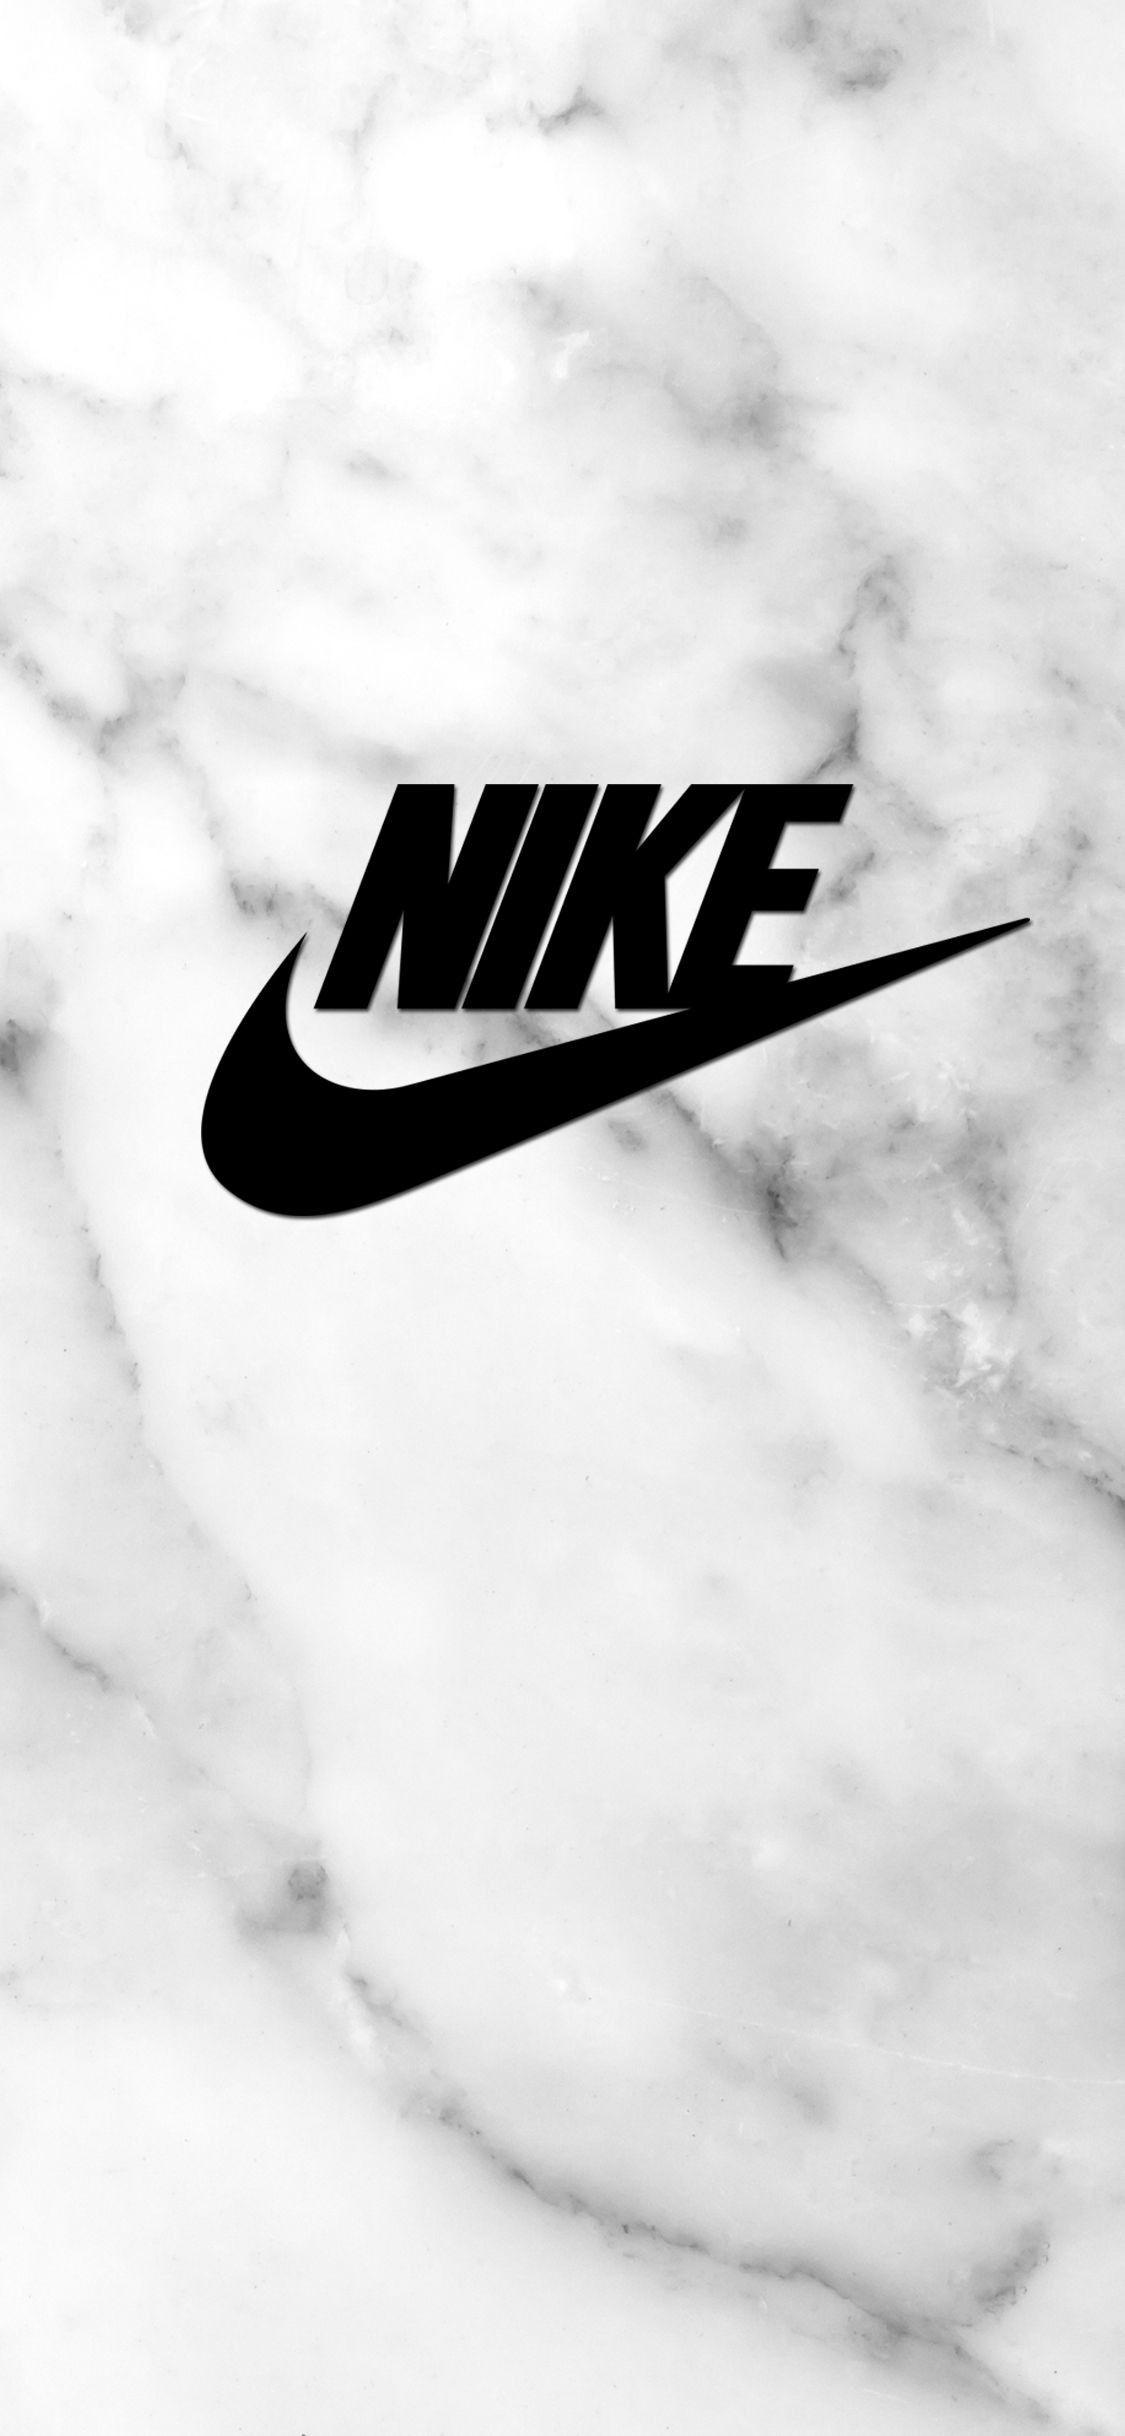 Awesome Nike Wallpaper Iphone 6s Nike Wallpaper Iphone Cool Nike Wallpapers Iphone Wallpaper